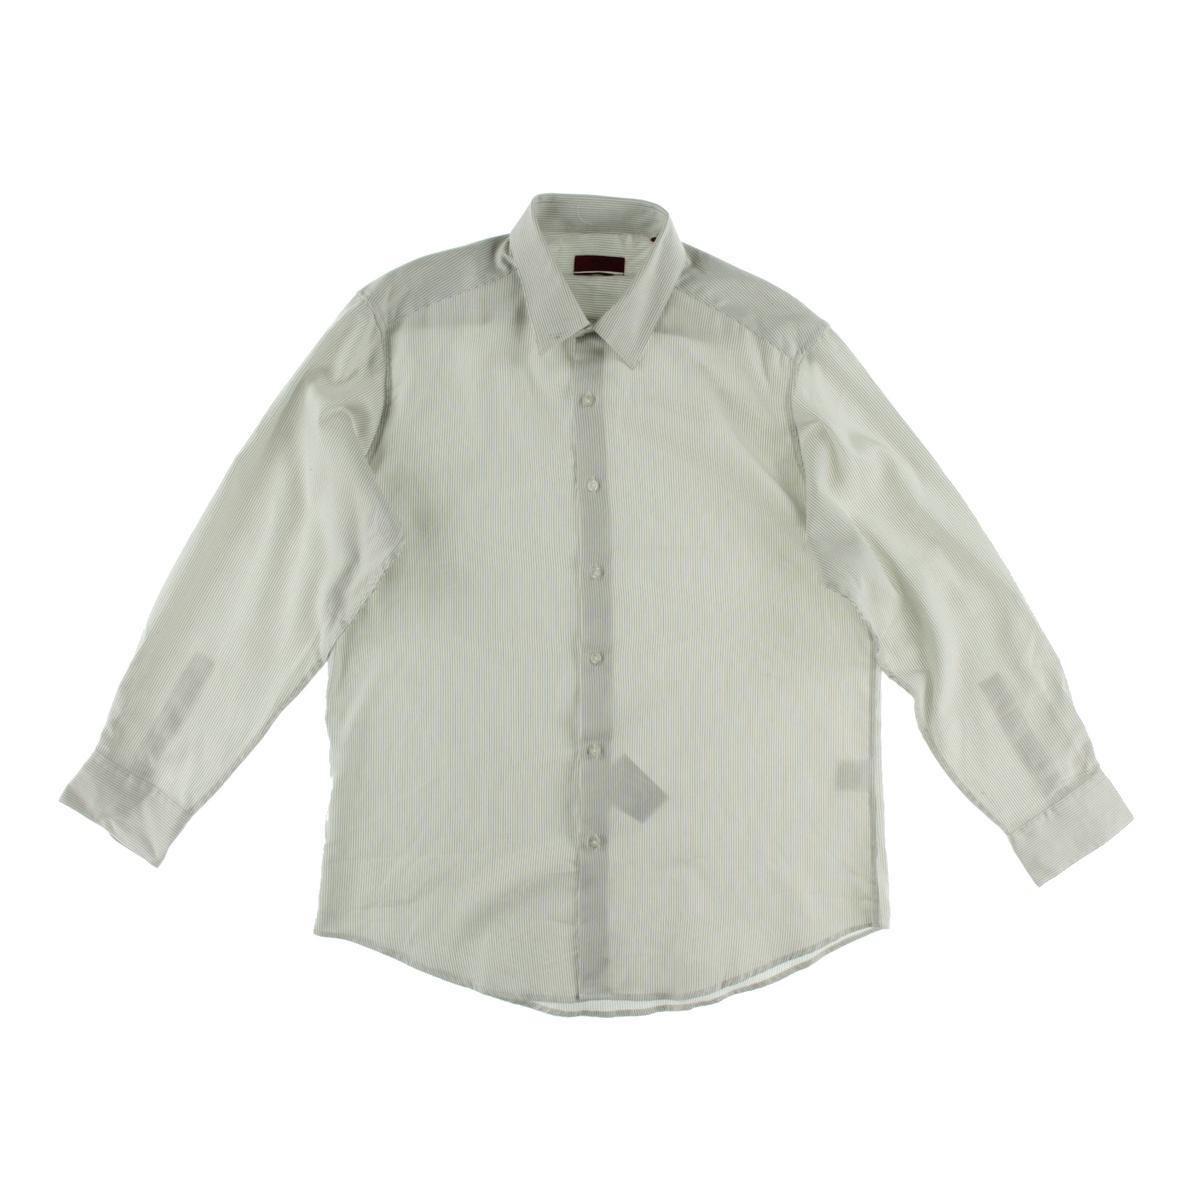 Alfani 9822 Mens White Fitted Striped Button Down Shirt 14